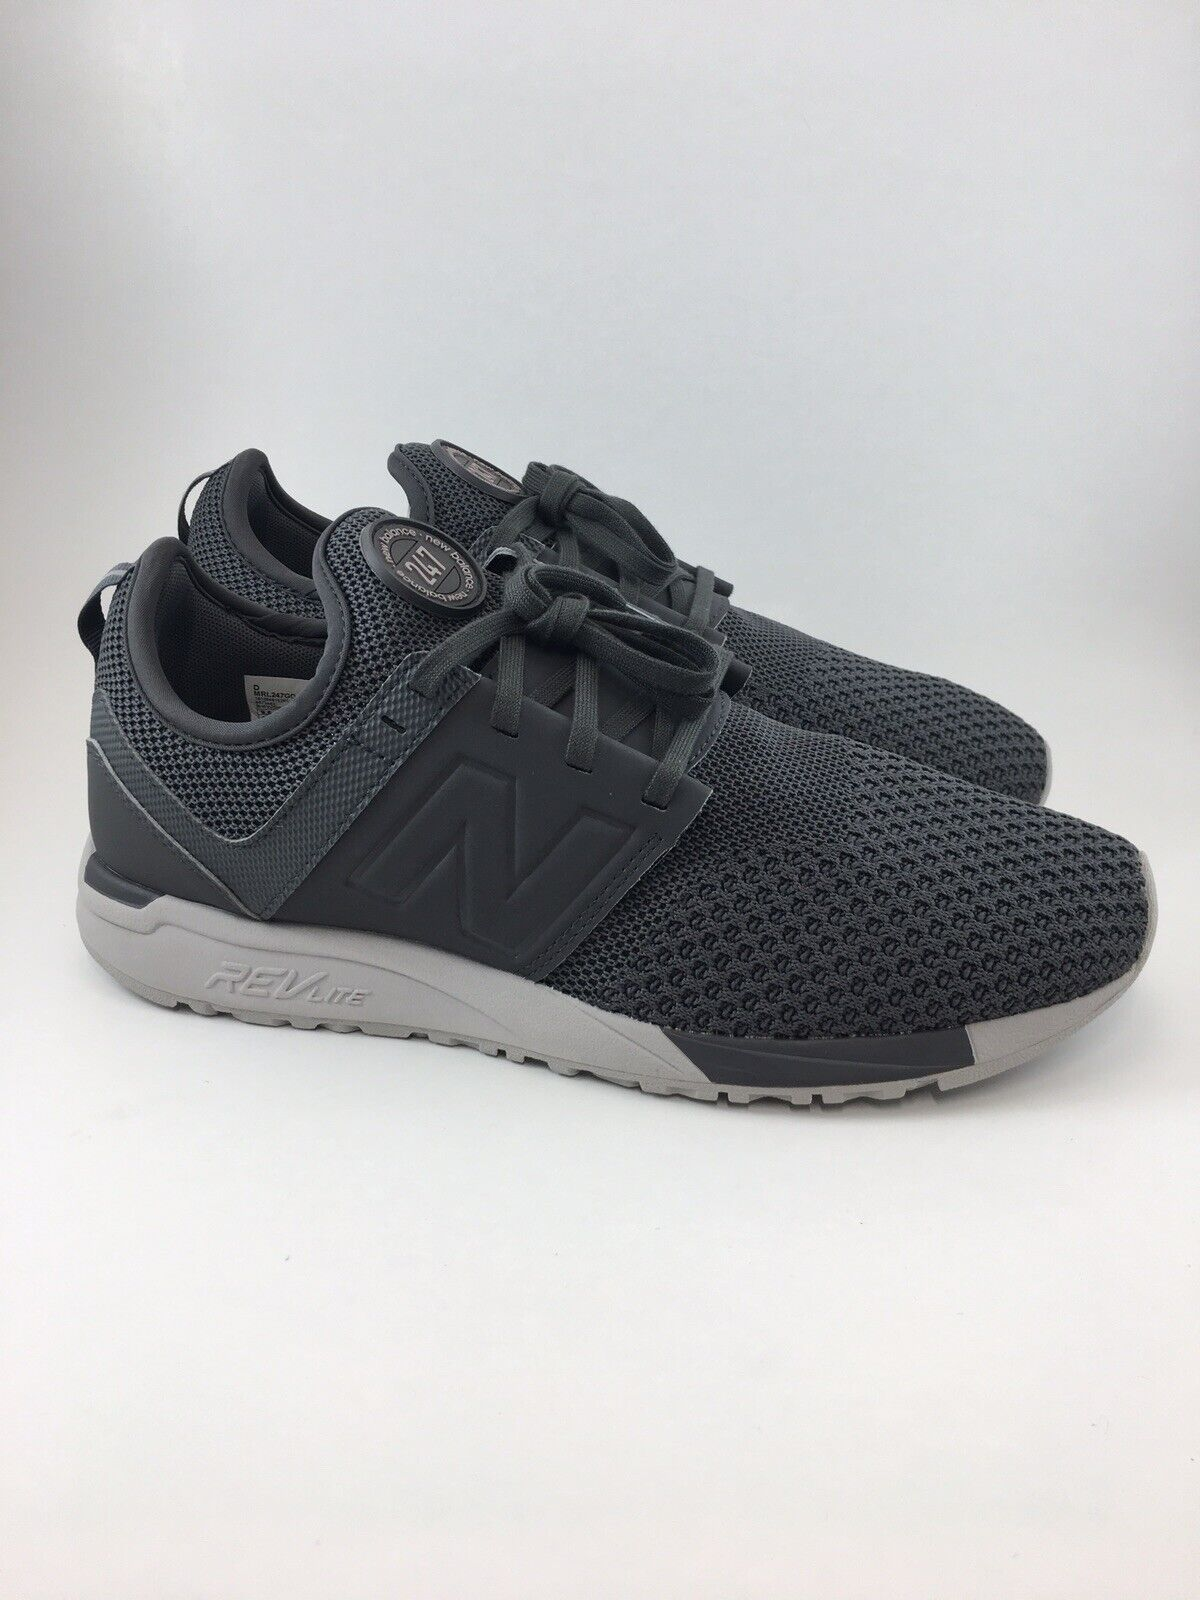 NEW Balance 247 Rev Lite Suede Shoes